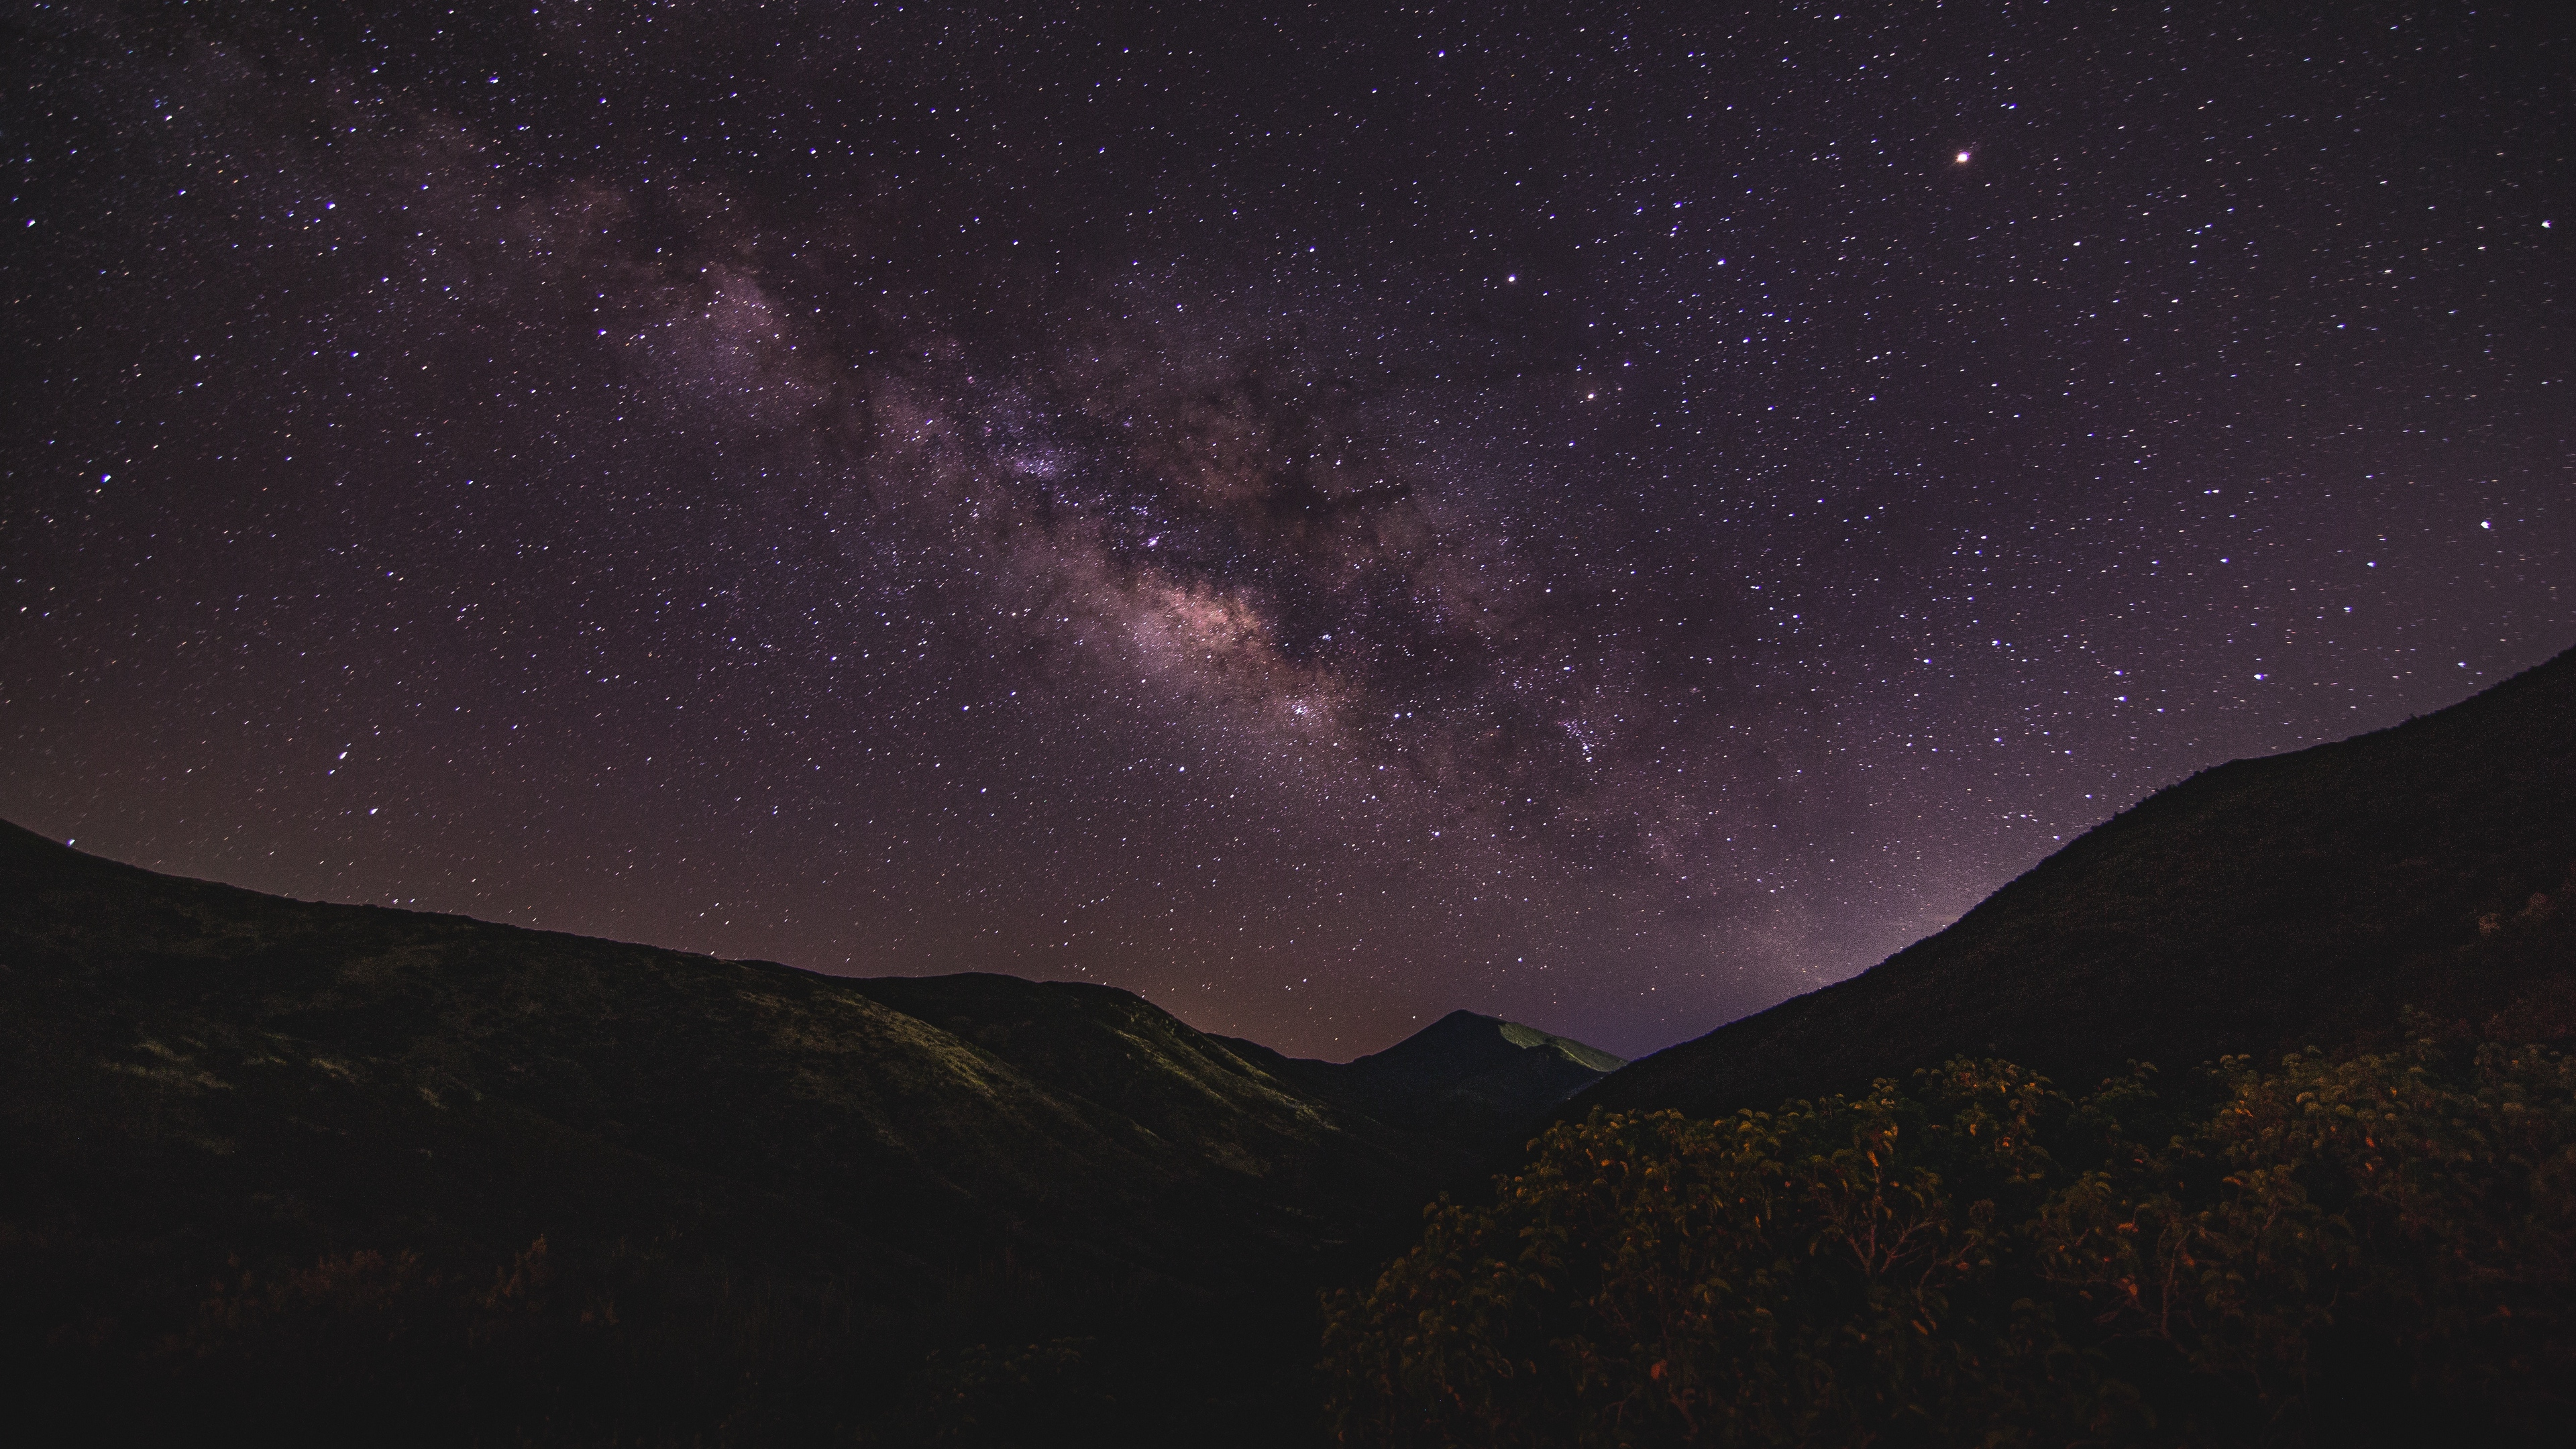 starry sky mountains night milky way 4k 1536016163 - starry sky, mountains, night, milky way 4k - starry sky, Night, Mountains